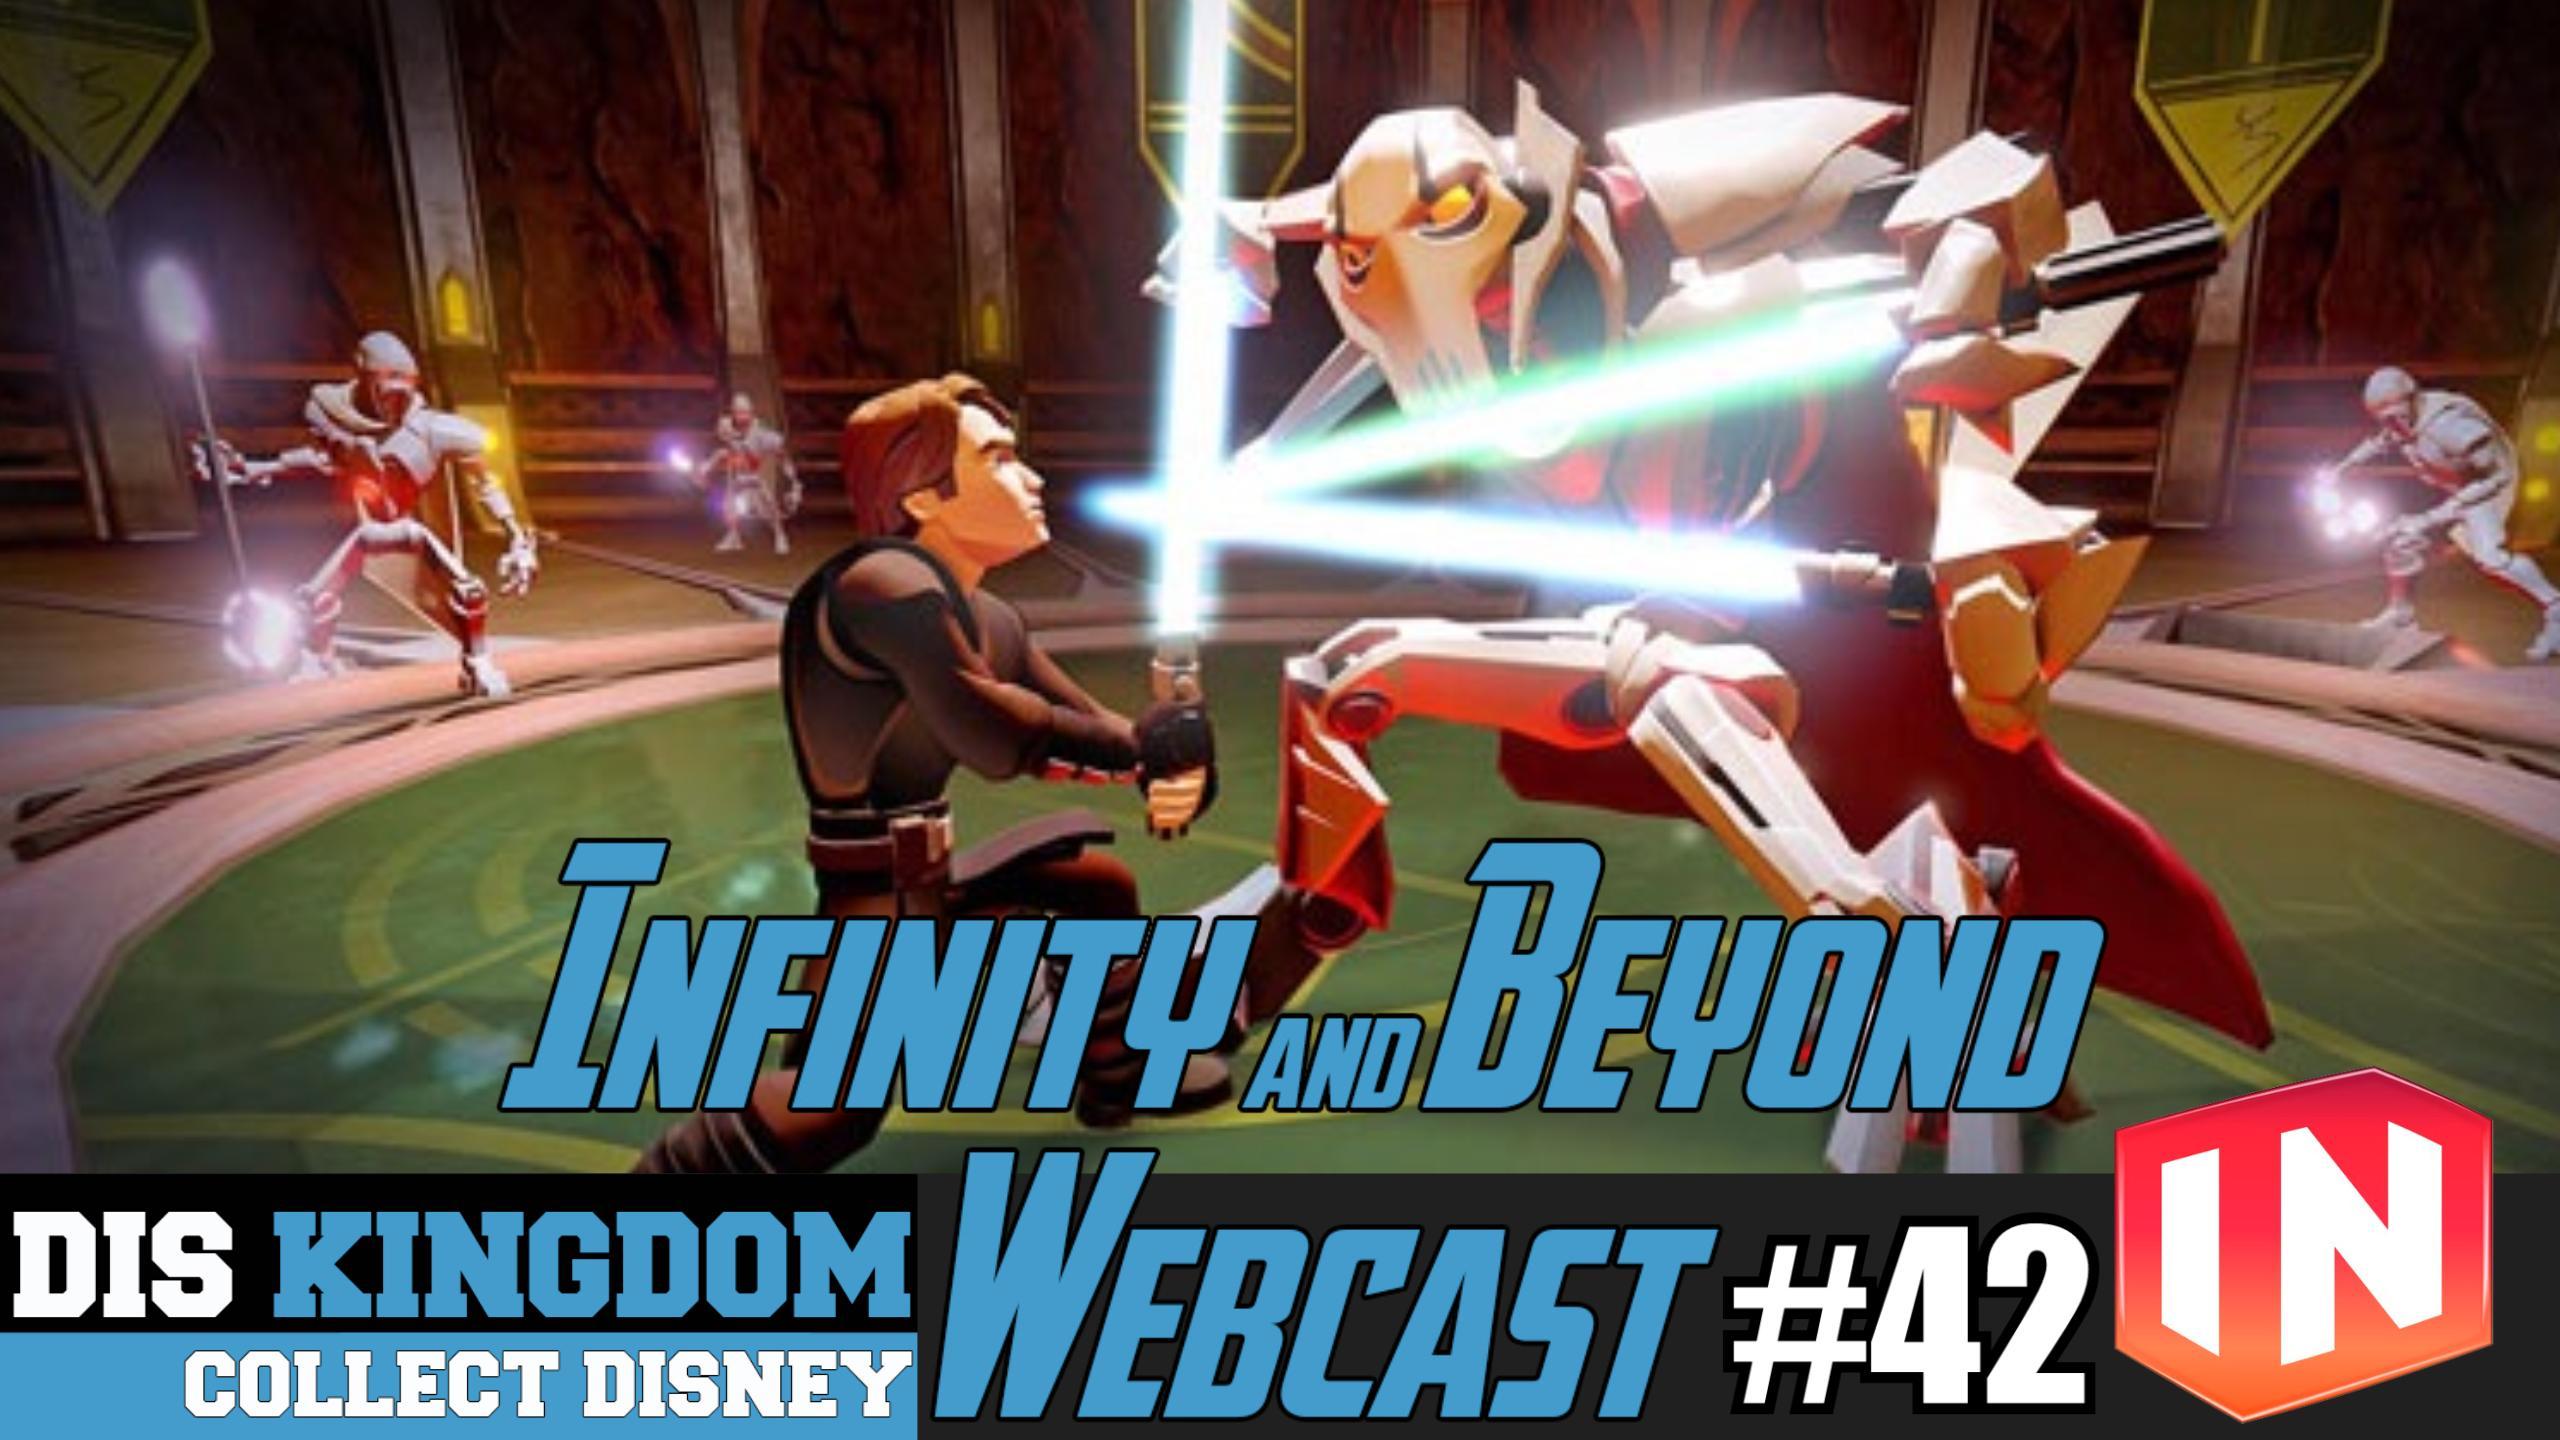 Disney Infinity & Beyond Webcast 42 – Disney Infinity 3.0 Latest